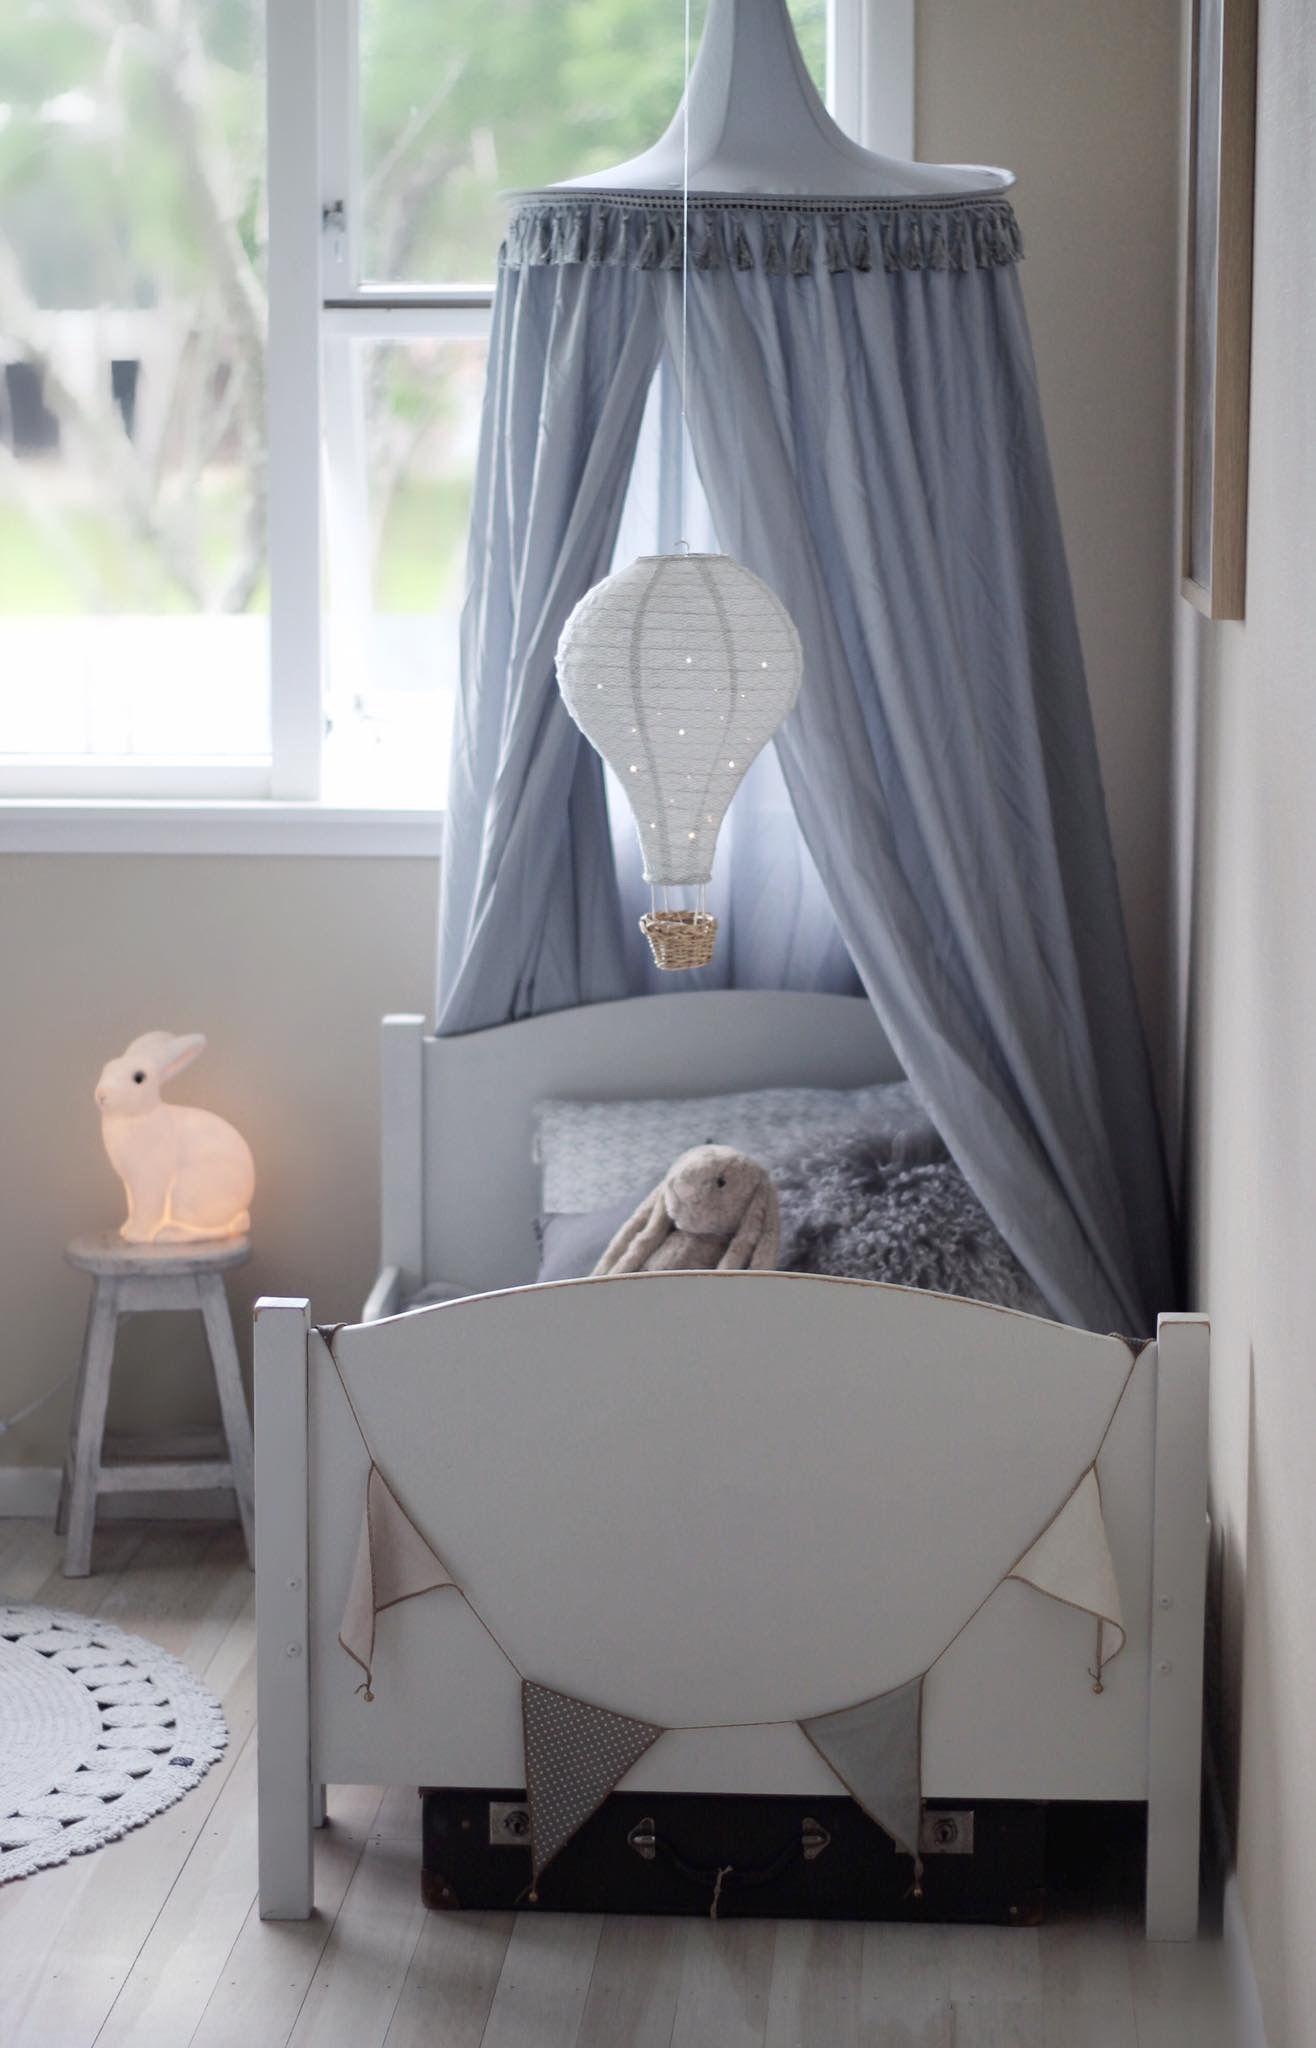 The 8 best kids rooms with canopies. soft blue grey canopy over childu0027s bed & Freddie u0026 Ava Canopy. #children #kids #nursery #kidsroom ...